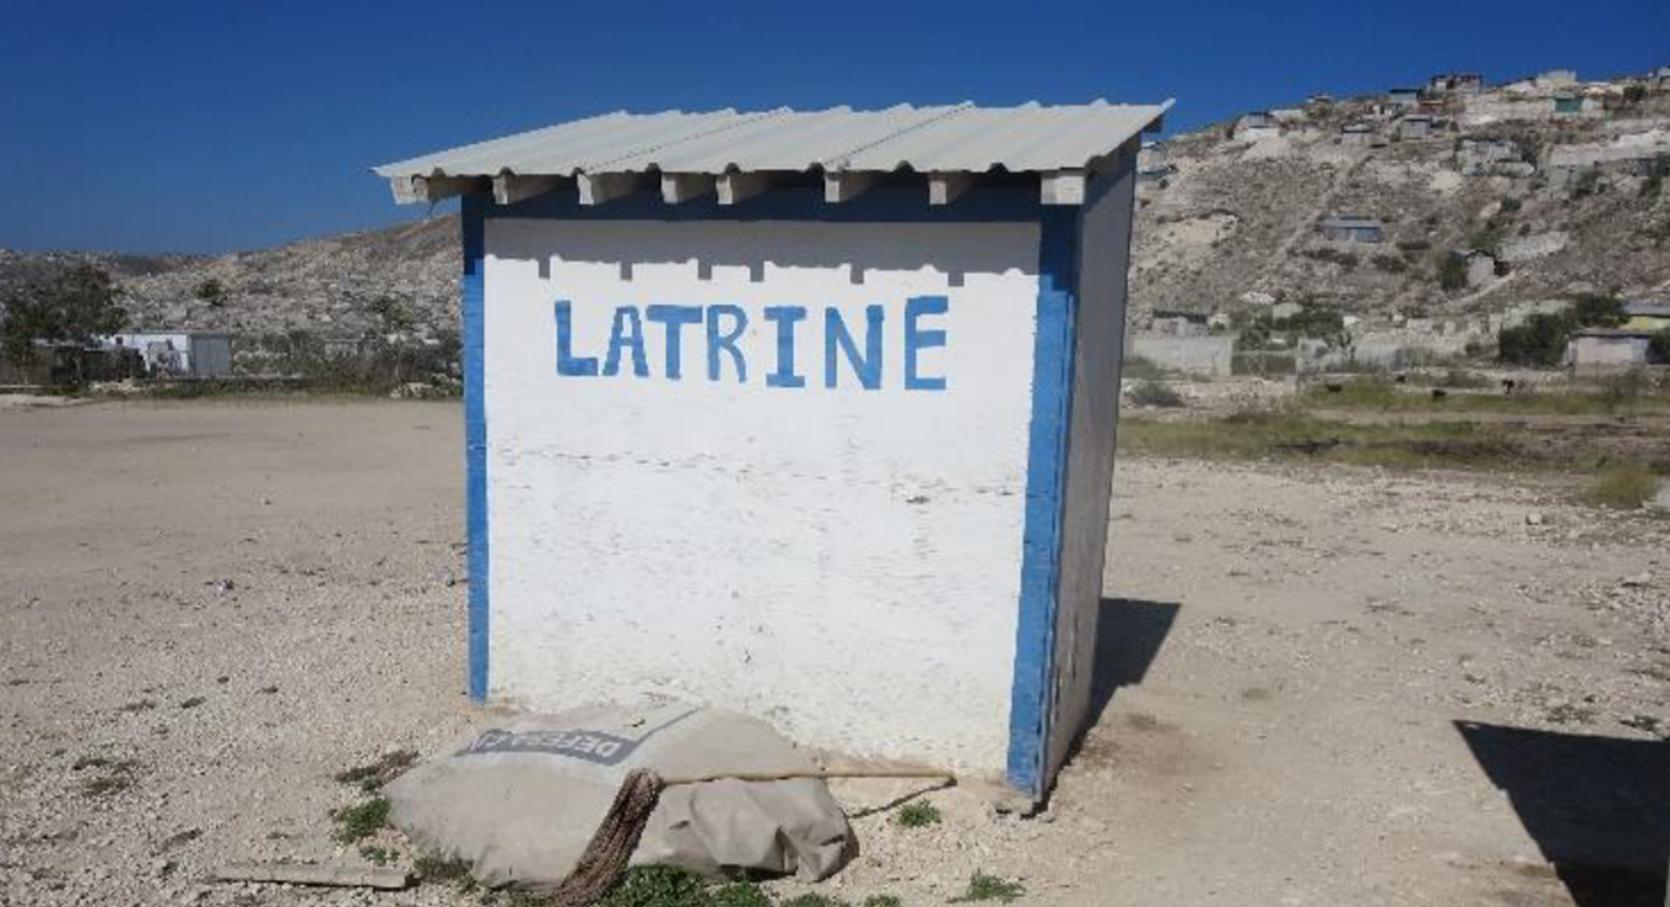 latrin